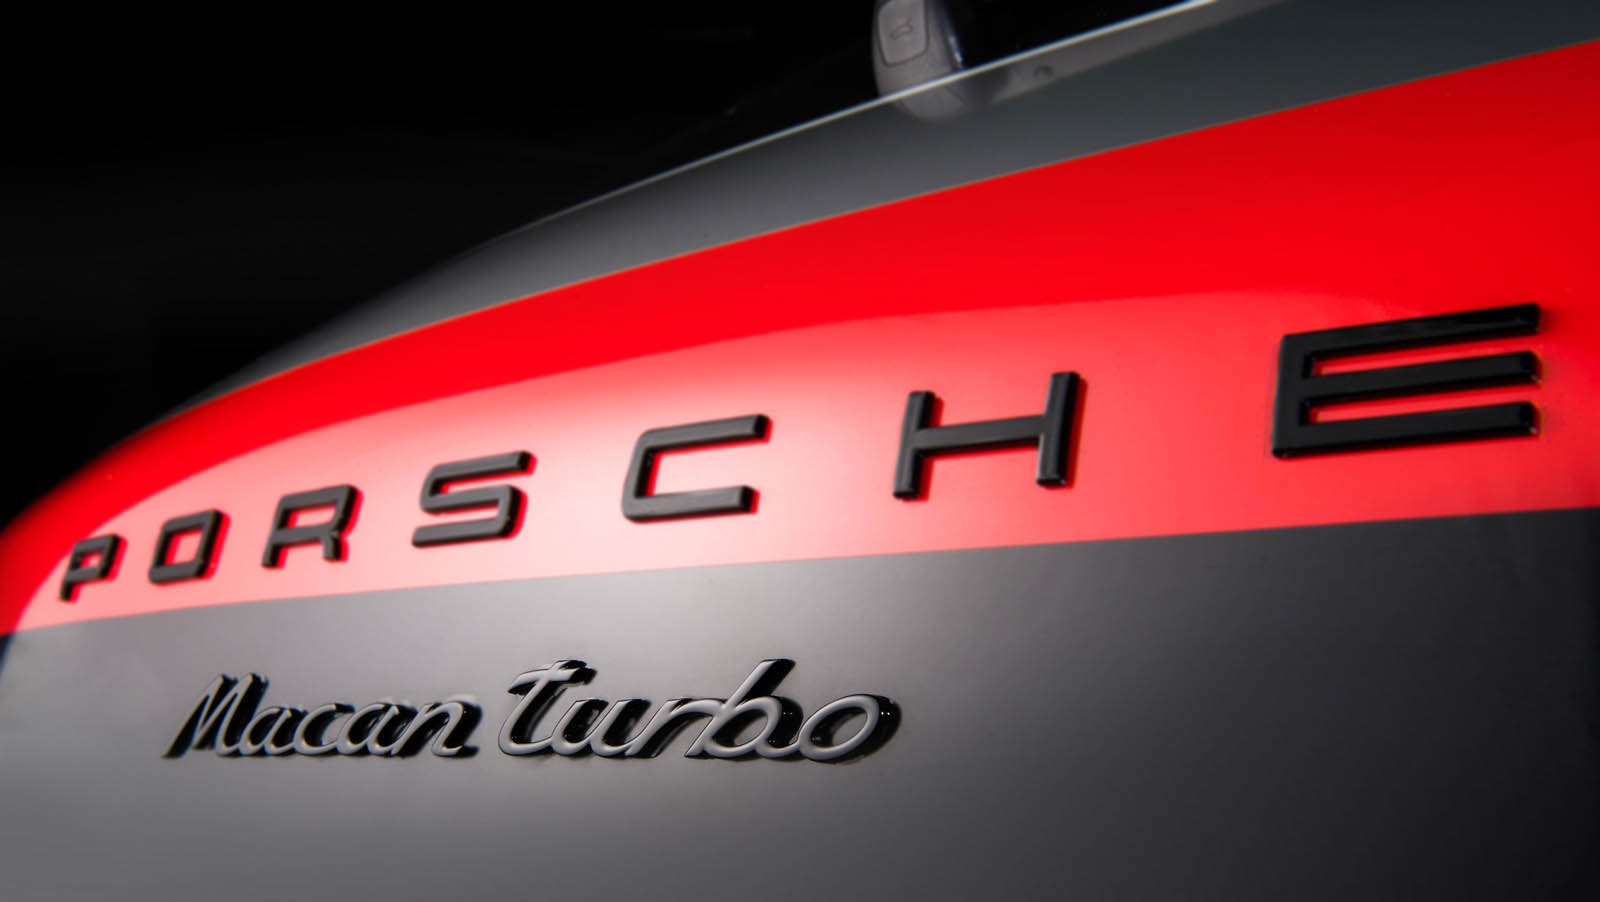 Porsche_Macan_Special_livery_09